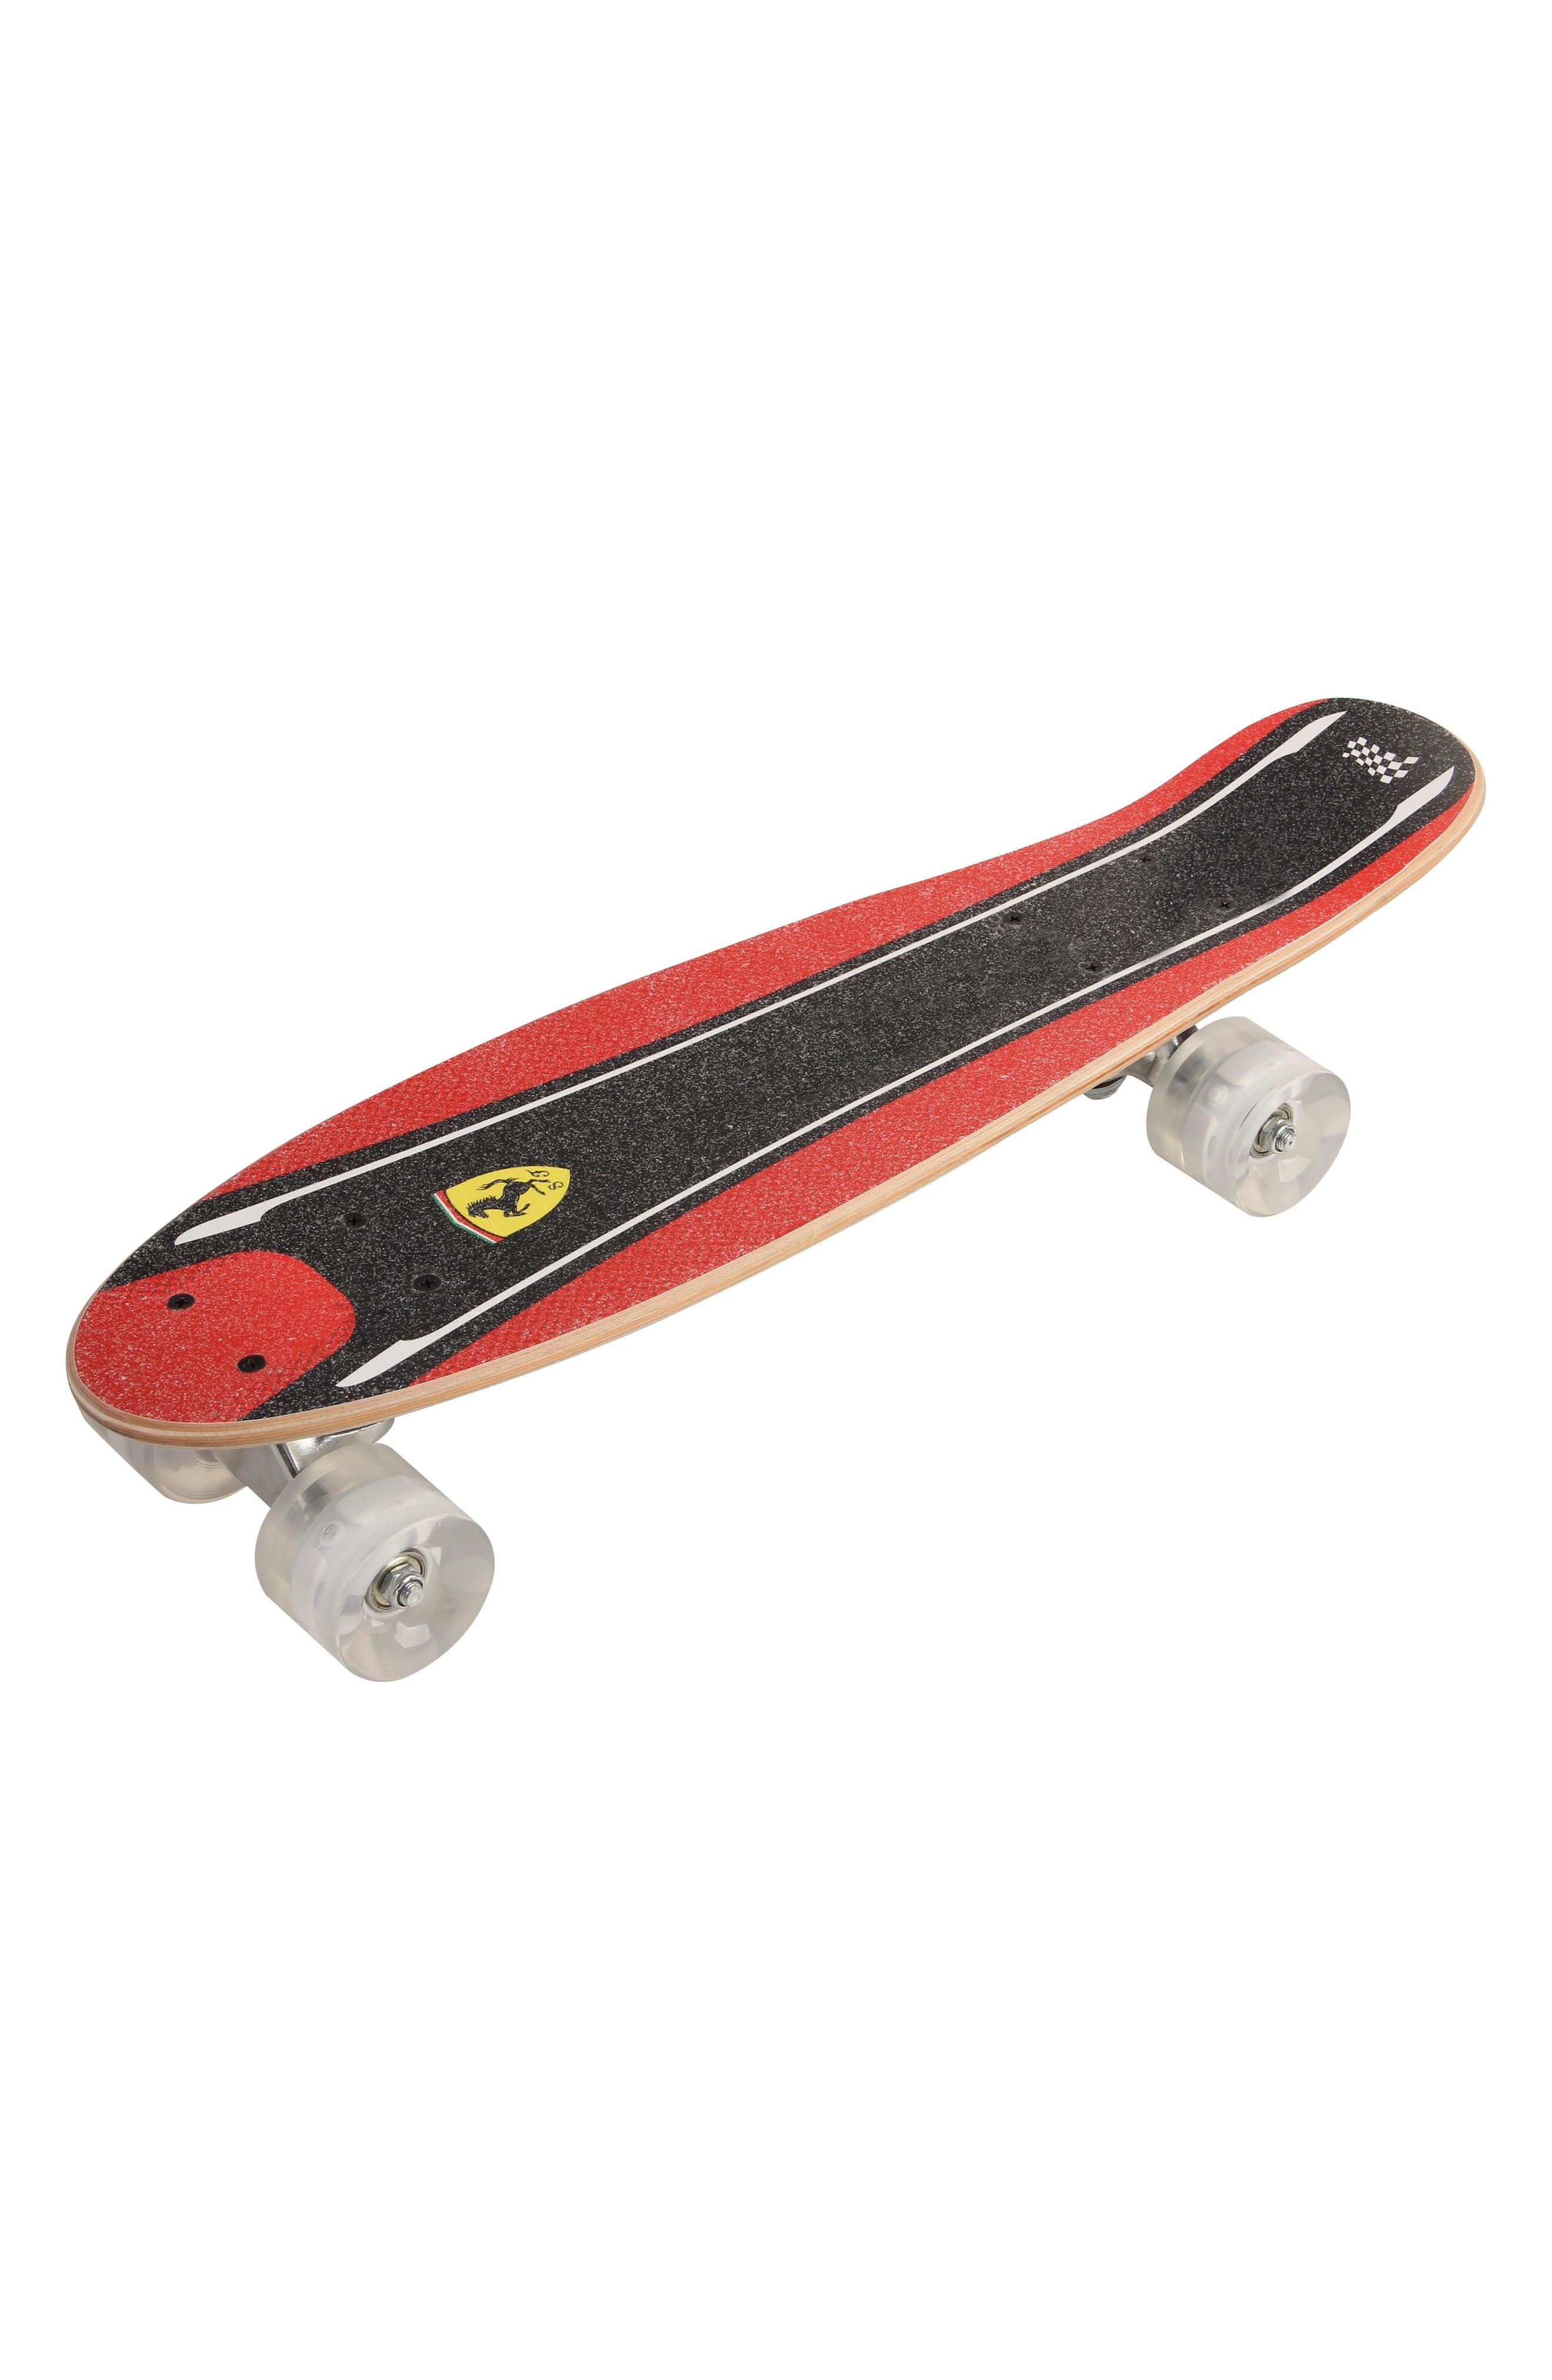 Main Image - Ferrari Skateboard